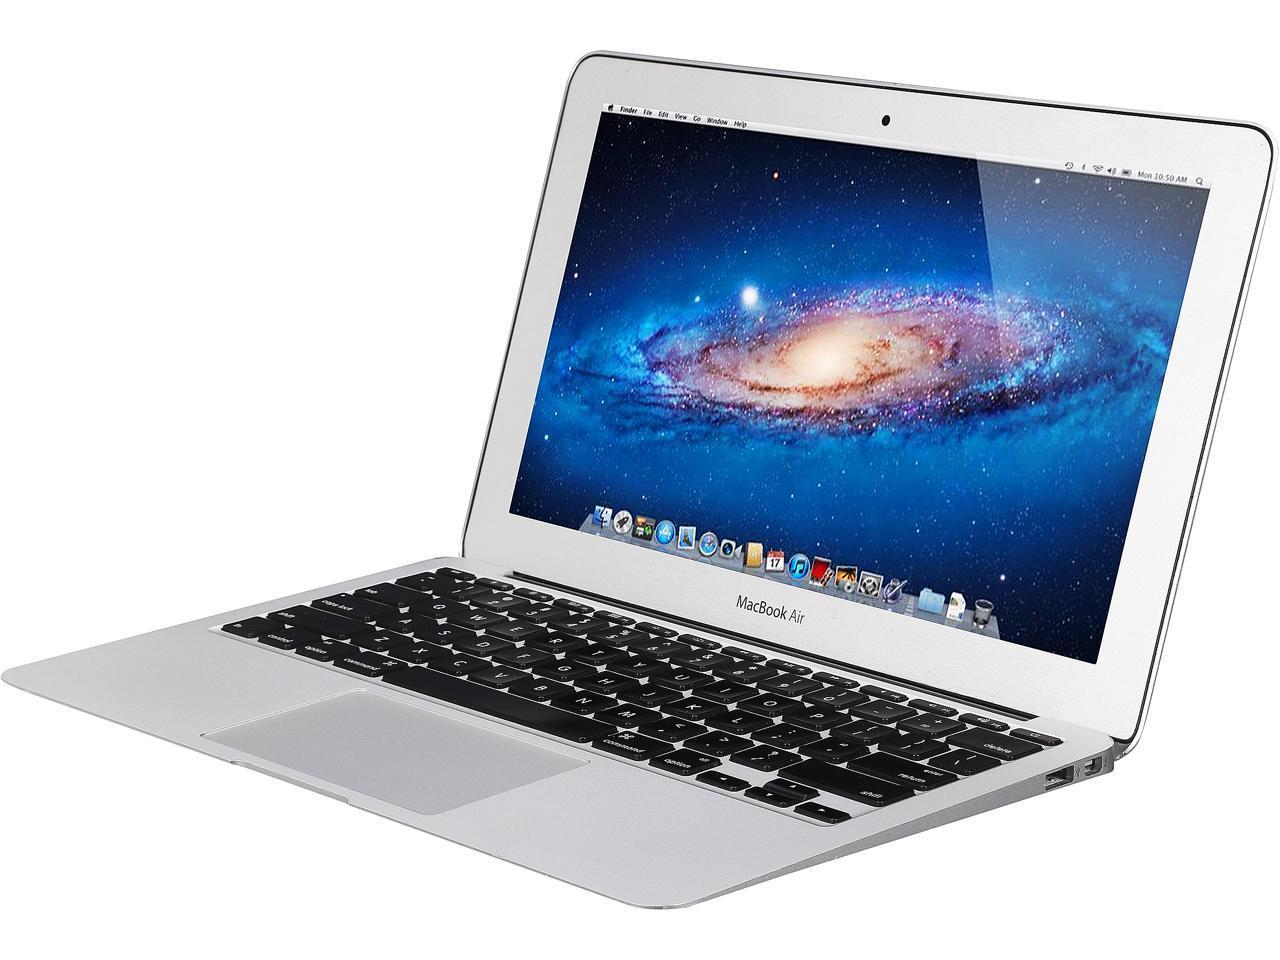 "Refurbished: Apple Laptop MacBook Air MC968LL/A Intel Core i5 2nd Gen 2467M (1.60 GHz) 2 GB Memory 64 GB SSD 11.6"" Mac OS X v10.7 Lion (B Grade)"